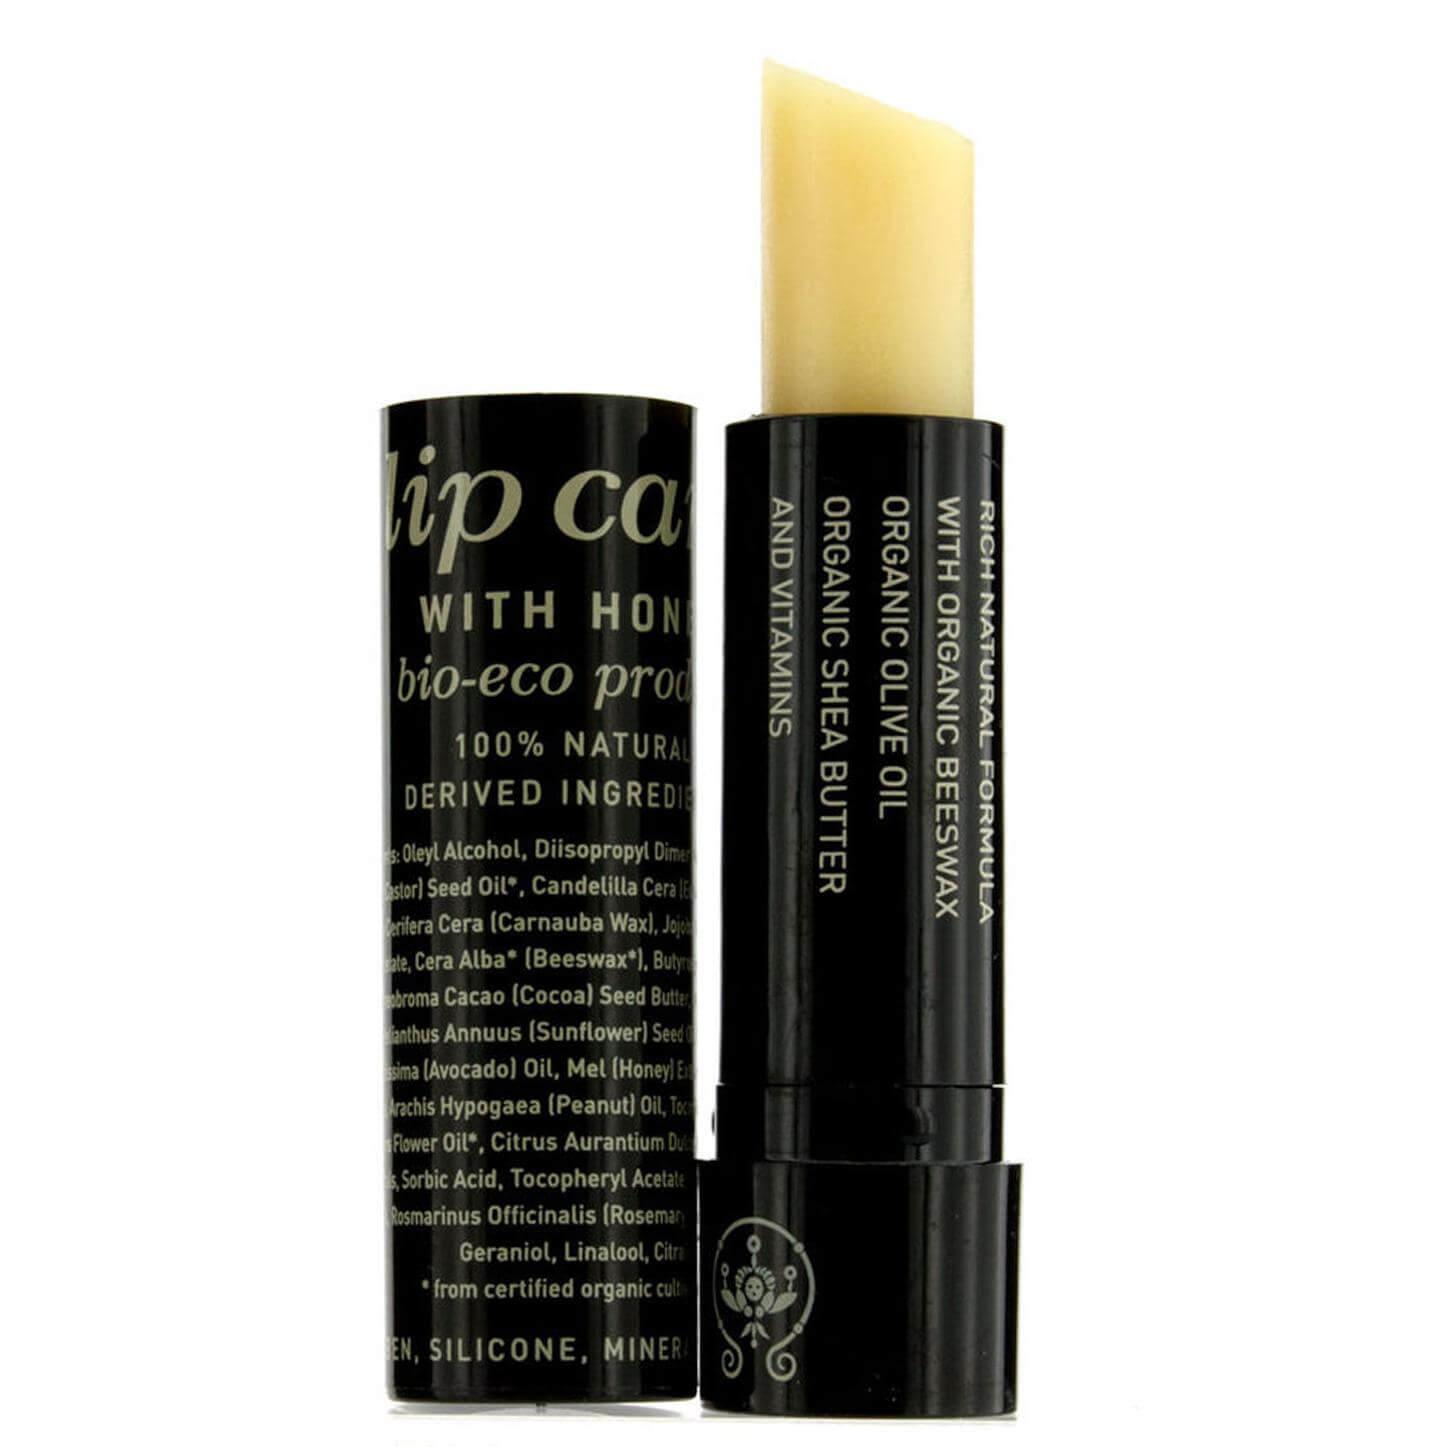 Apivita Lip Care με Πρόπολη Με Κερί Μελισσών & Λάδι Ελιάς 4.4g